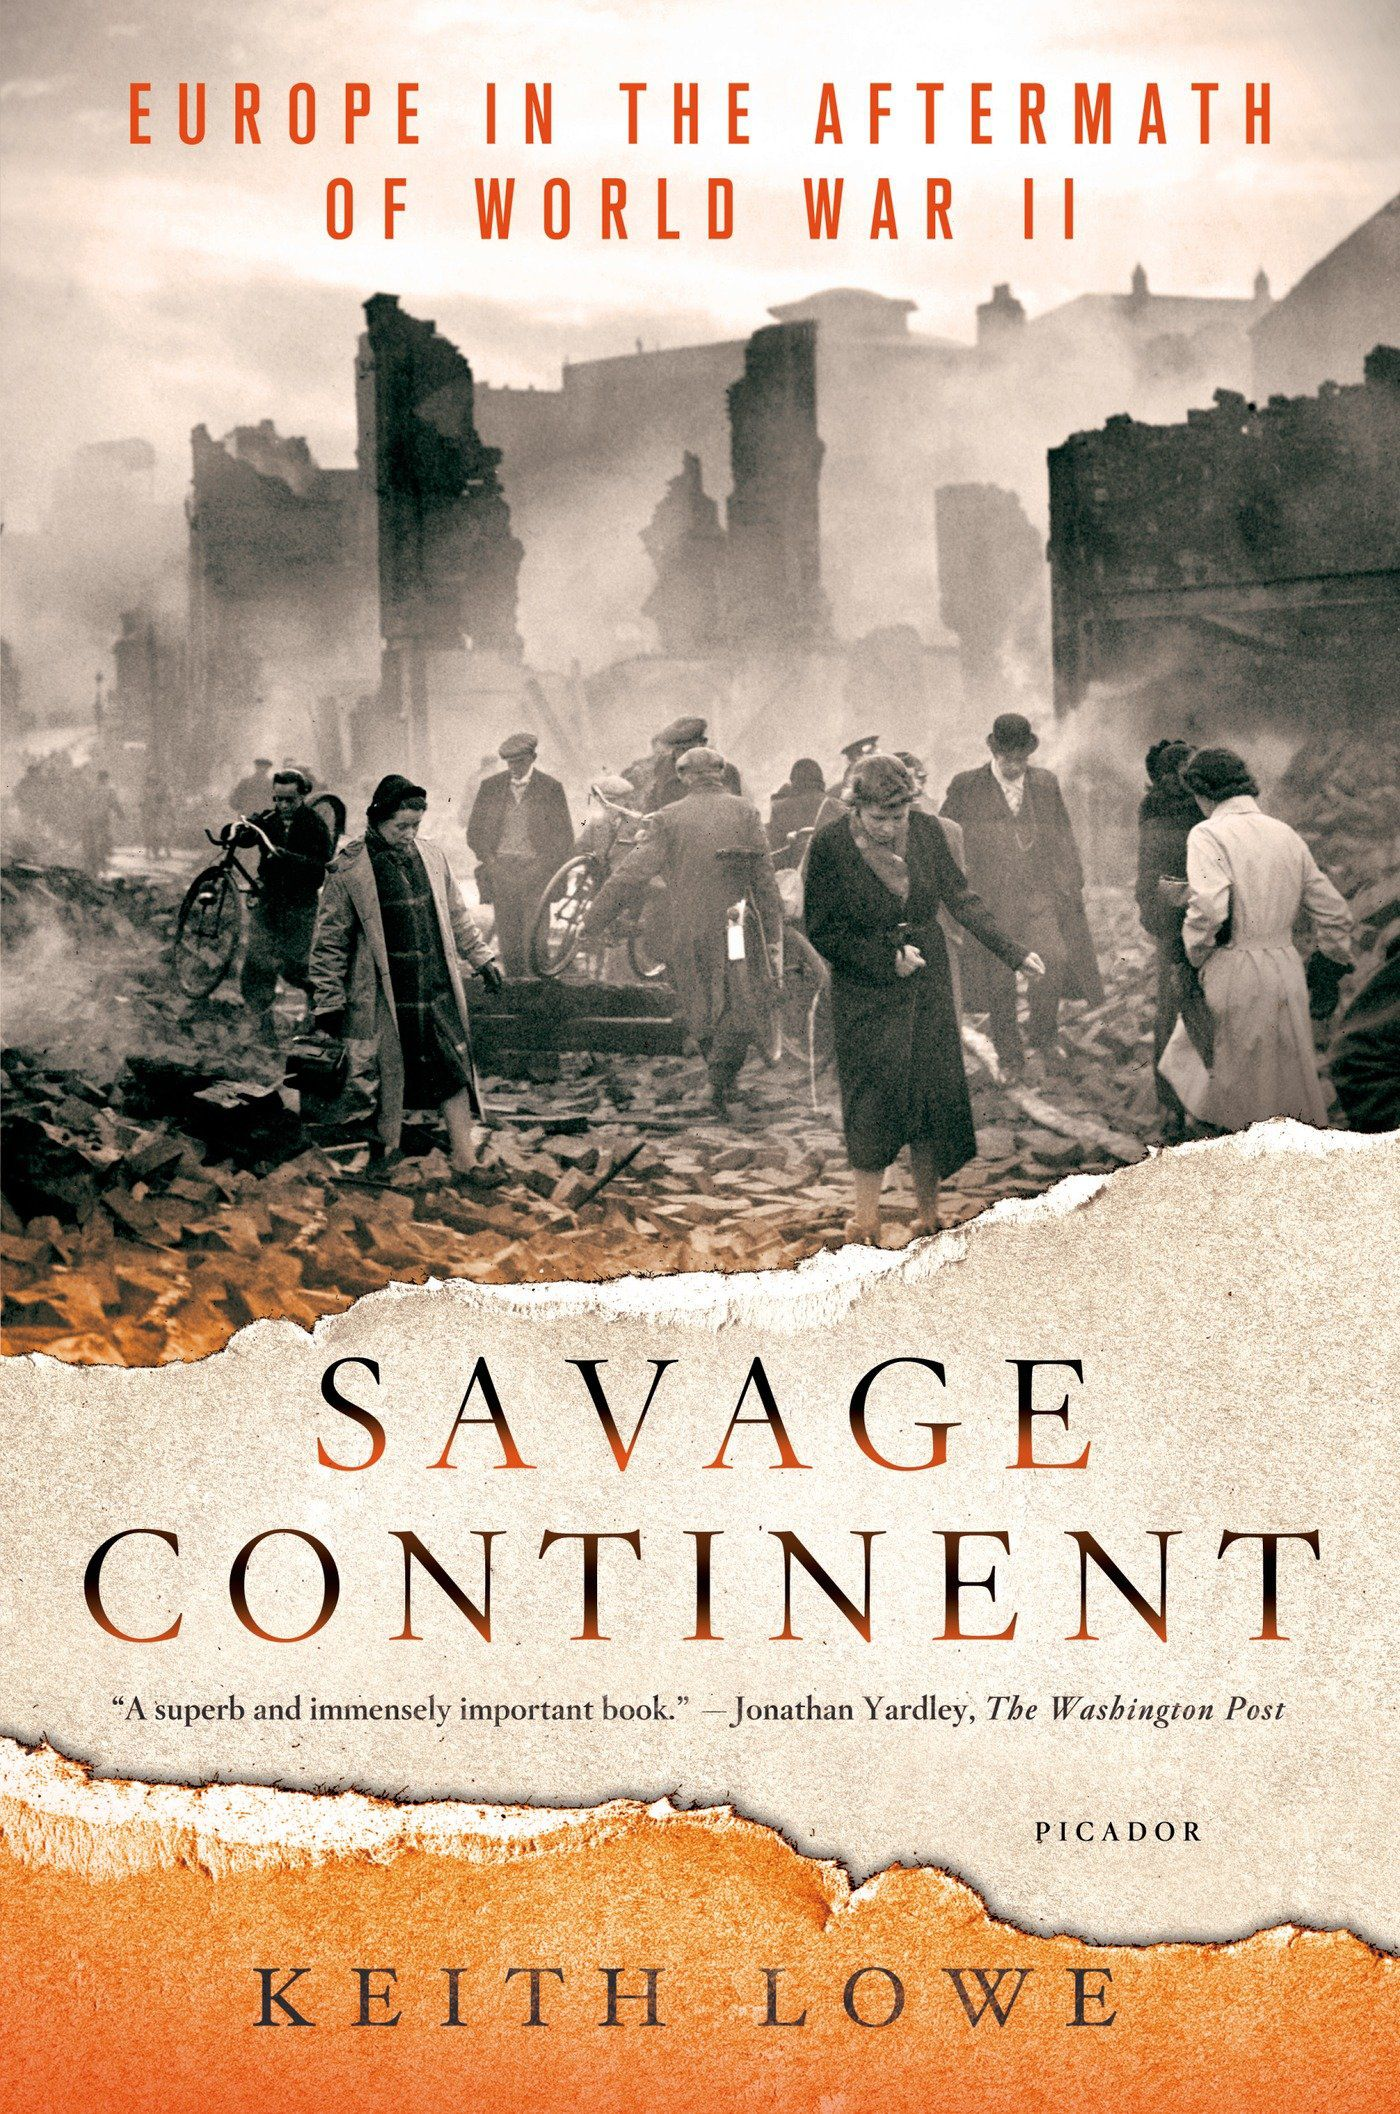 savage continent by keith lowe.jpg.optimal